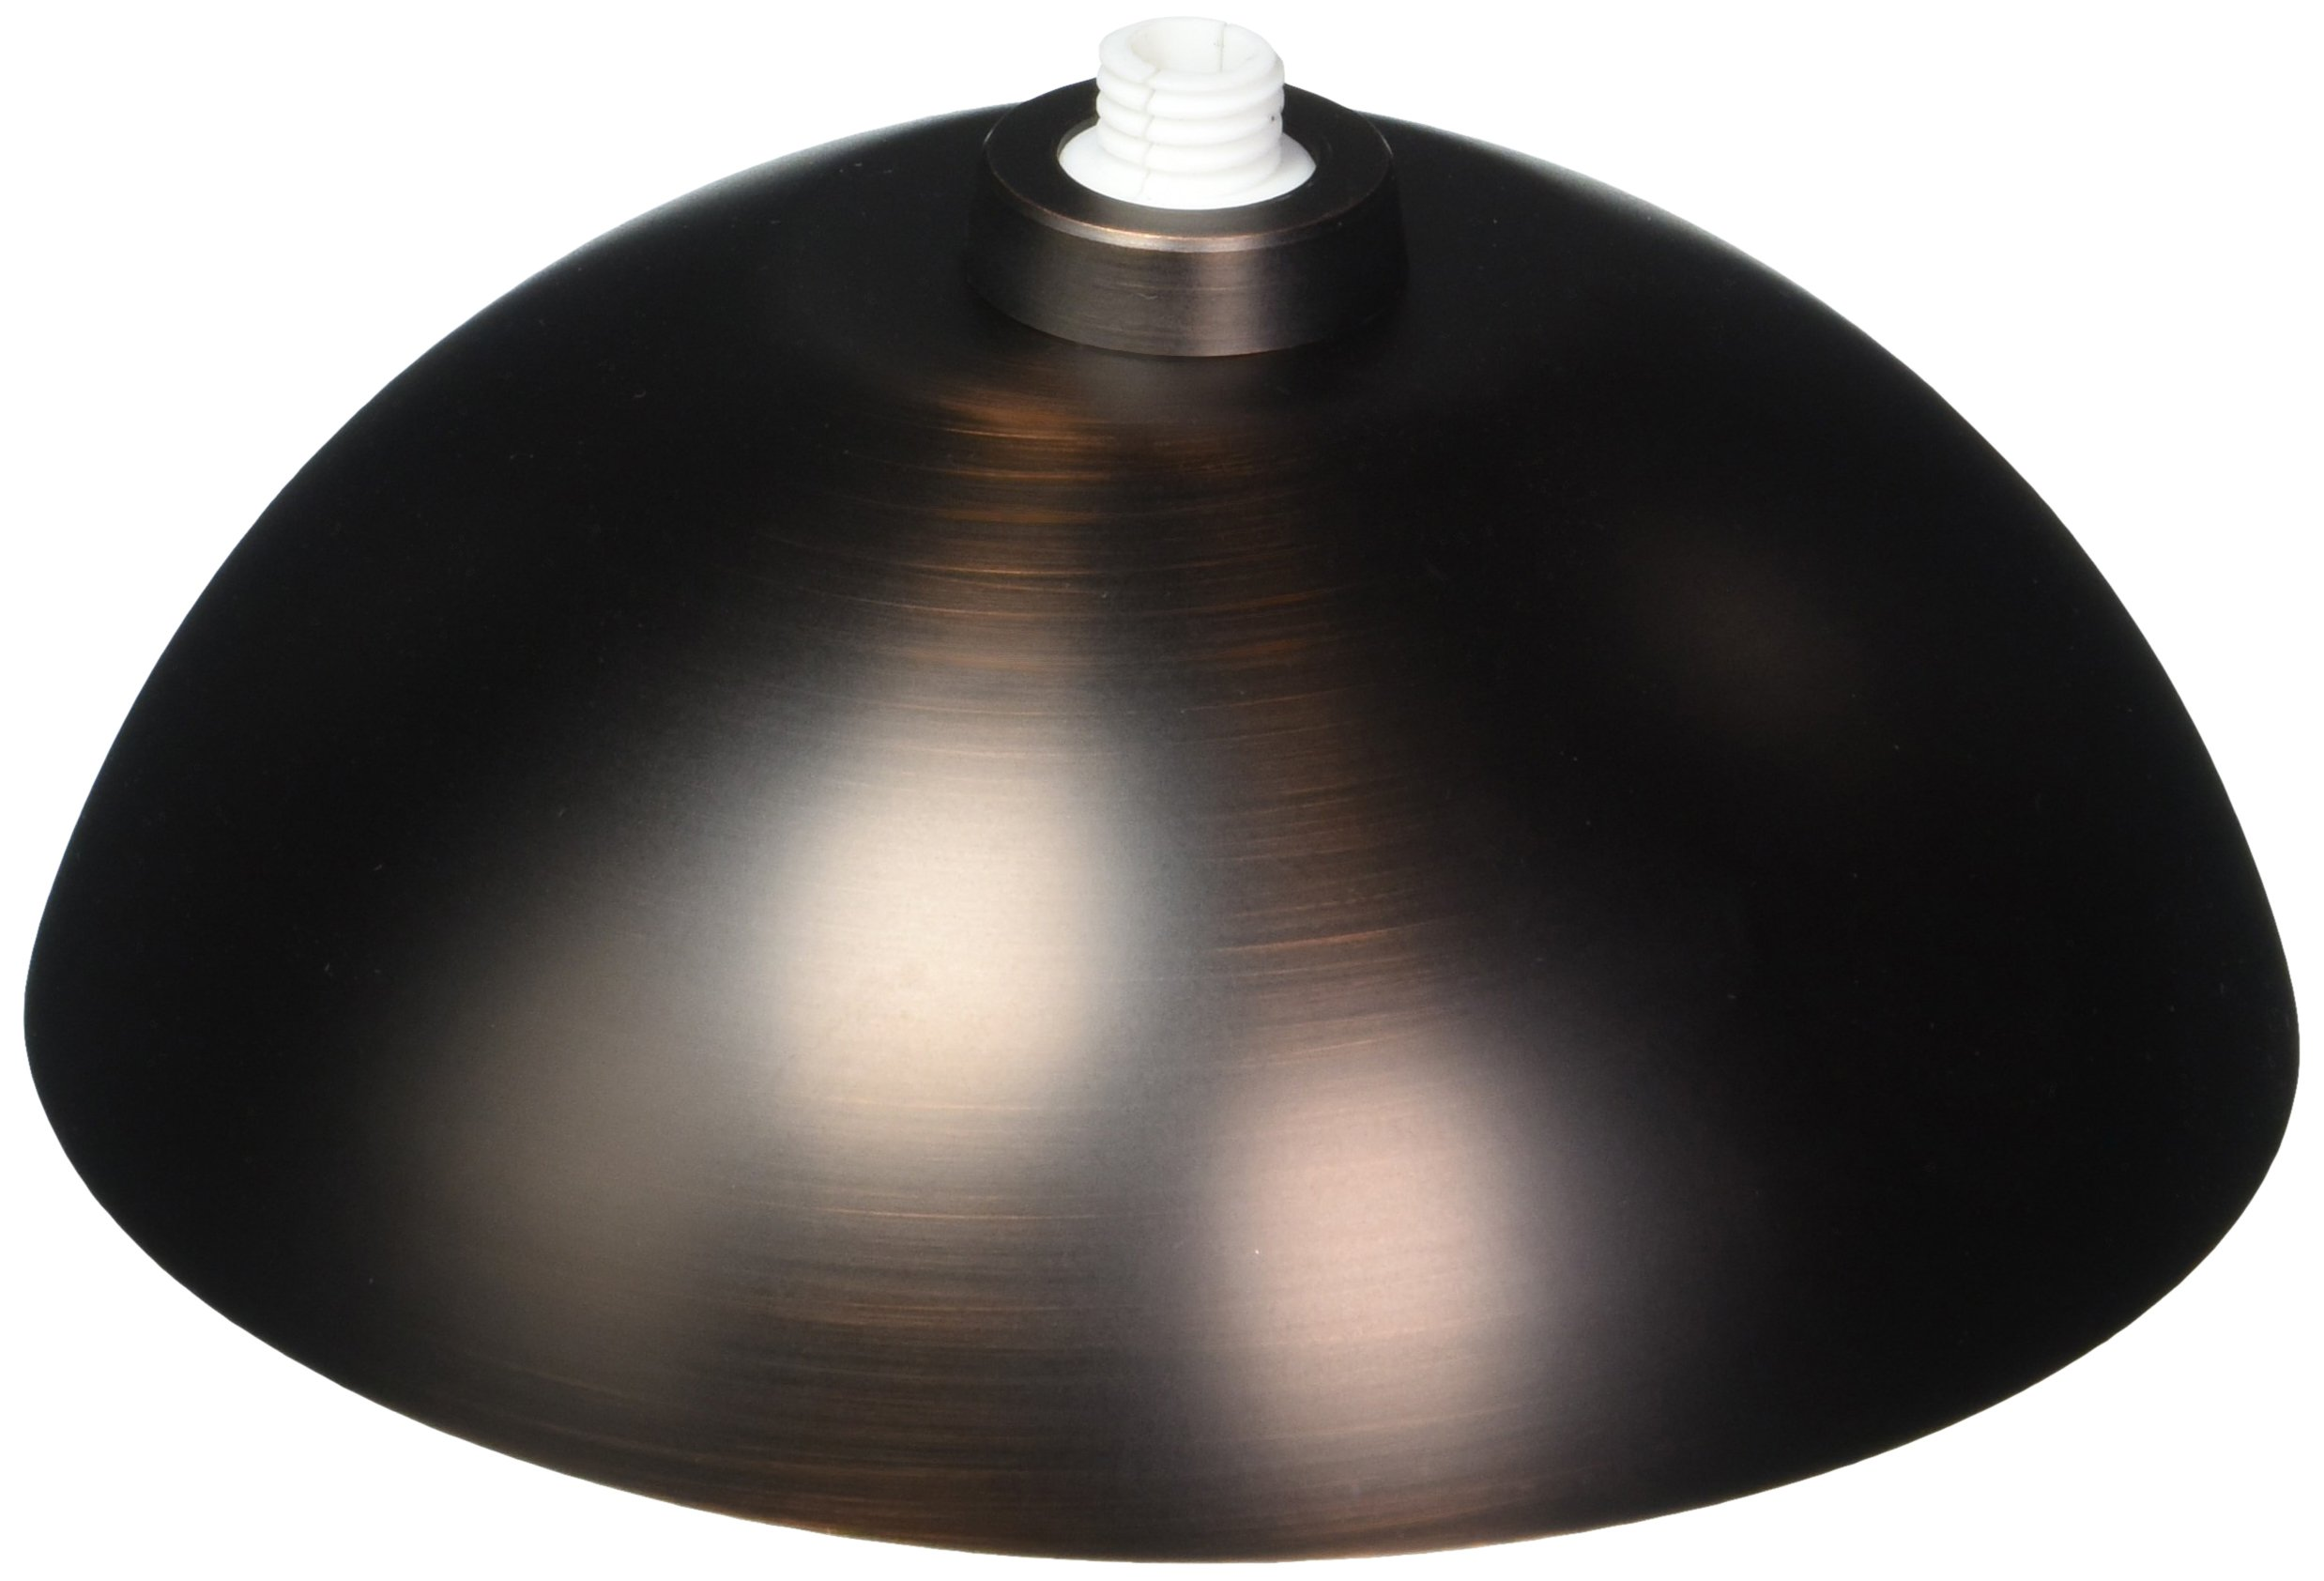 Uni-Jack - Dome UniJack Mono-Pod - Bronze Finish by Access Lighting - HI